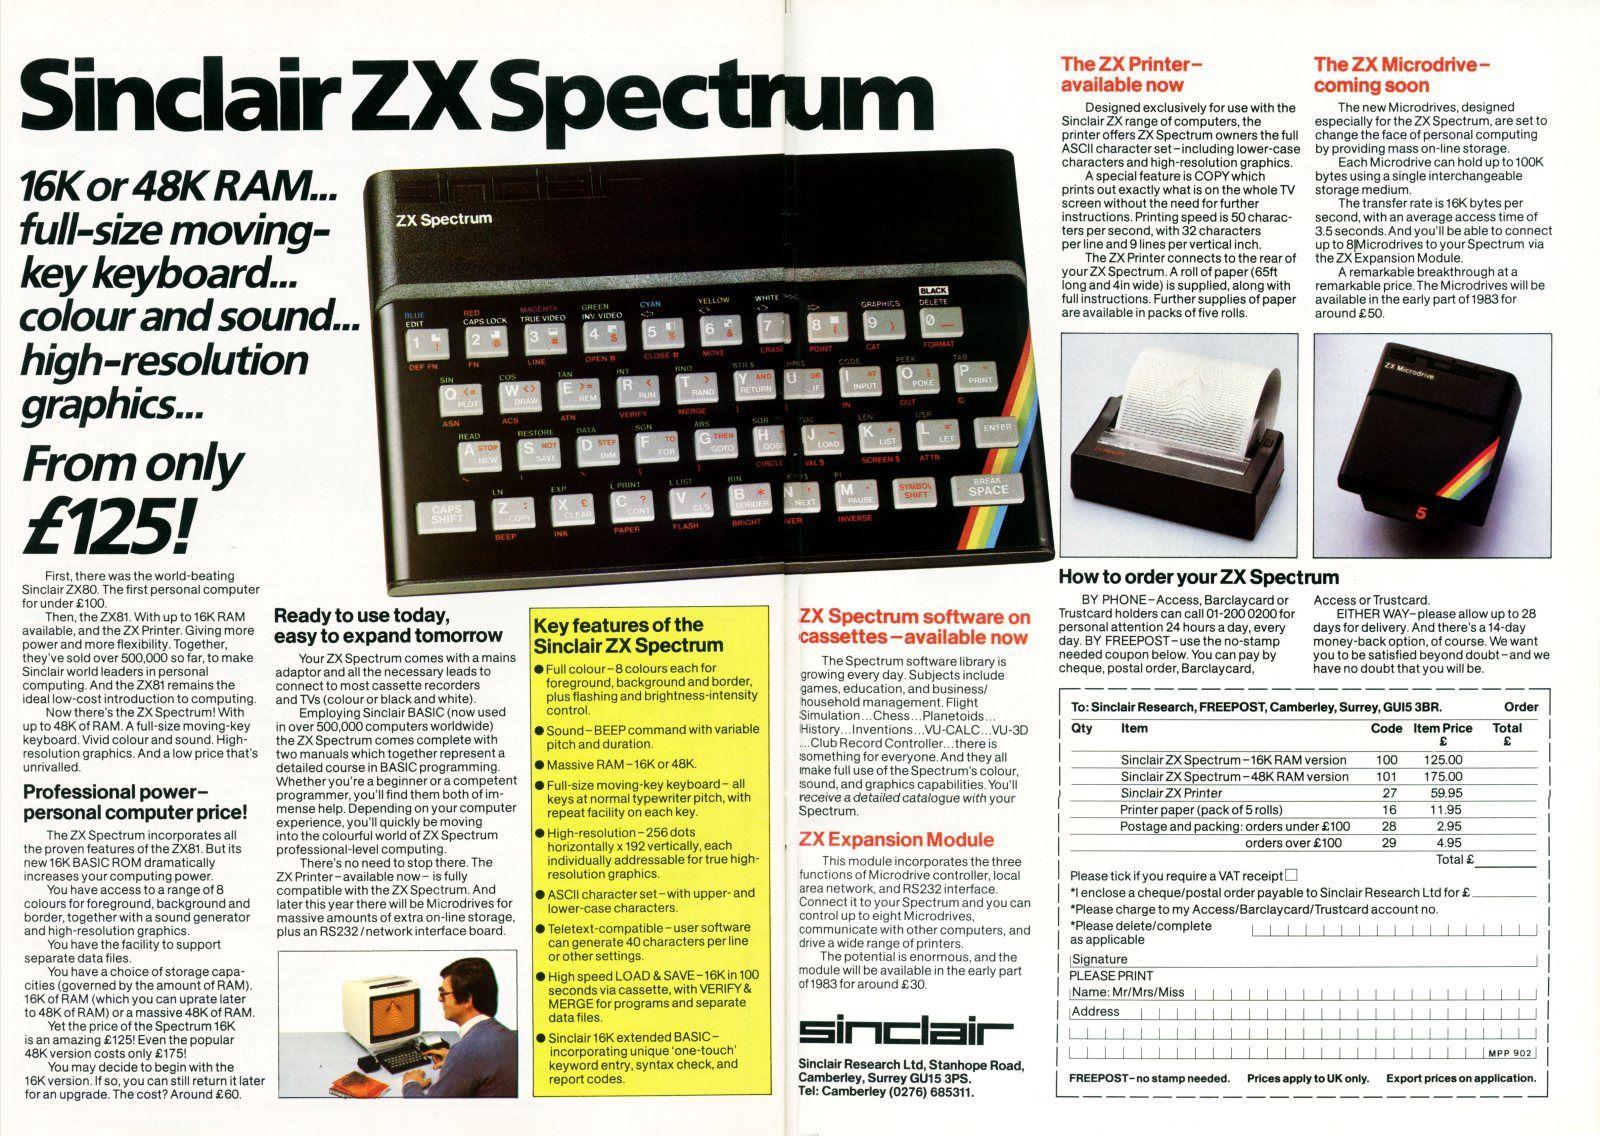 I always had a Vic20. Got the Spectrum app on my iPad